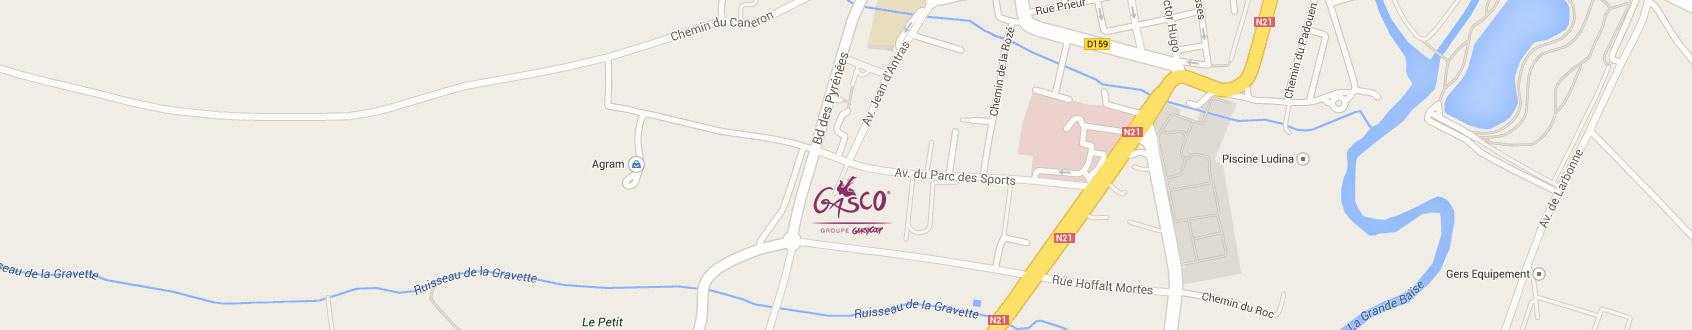 map_gasco1